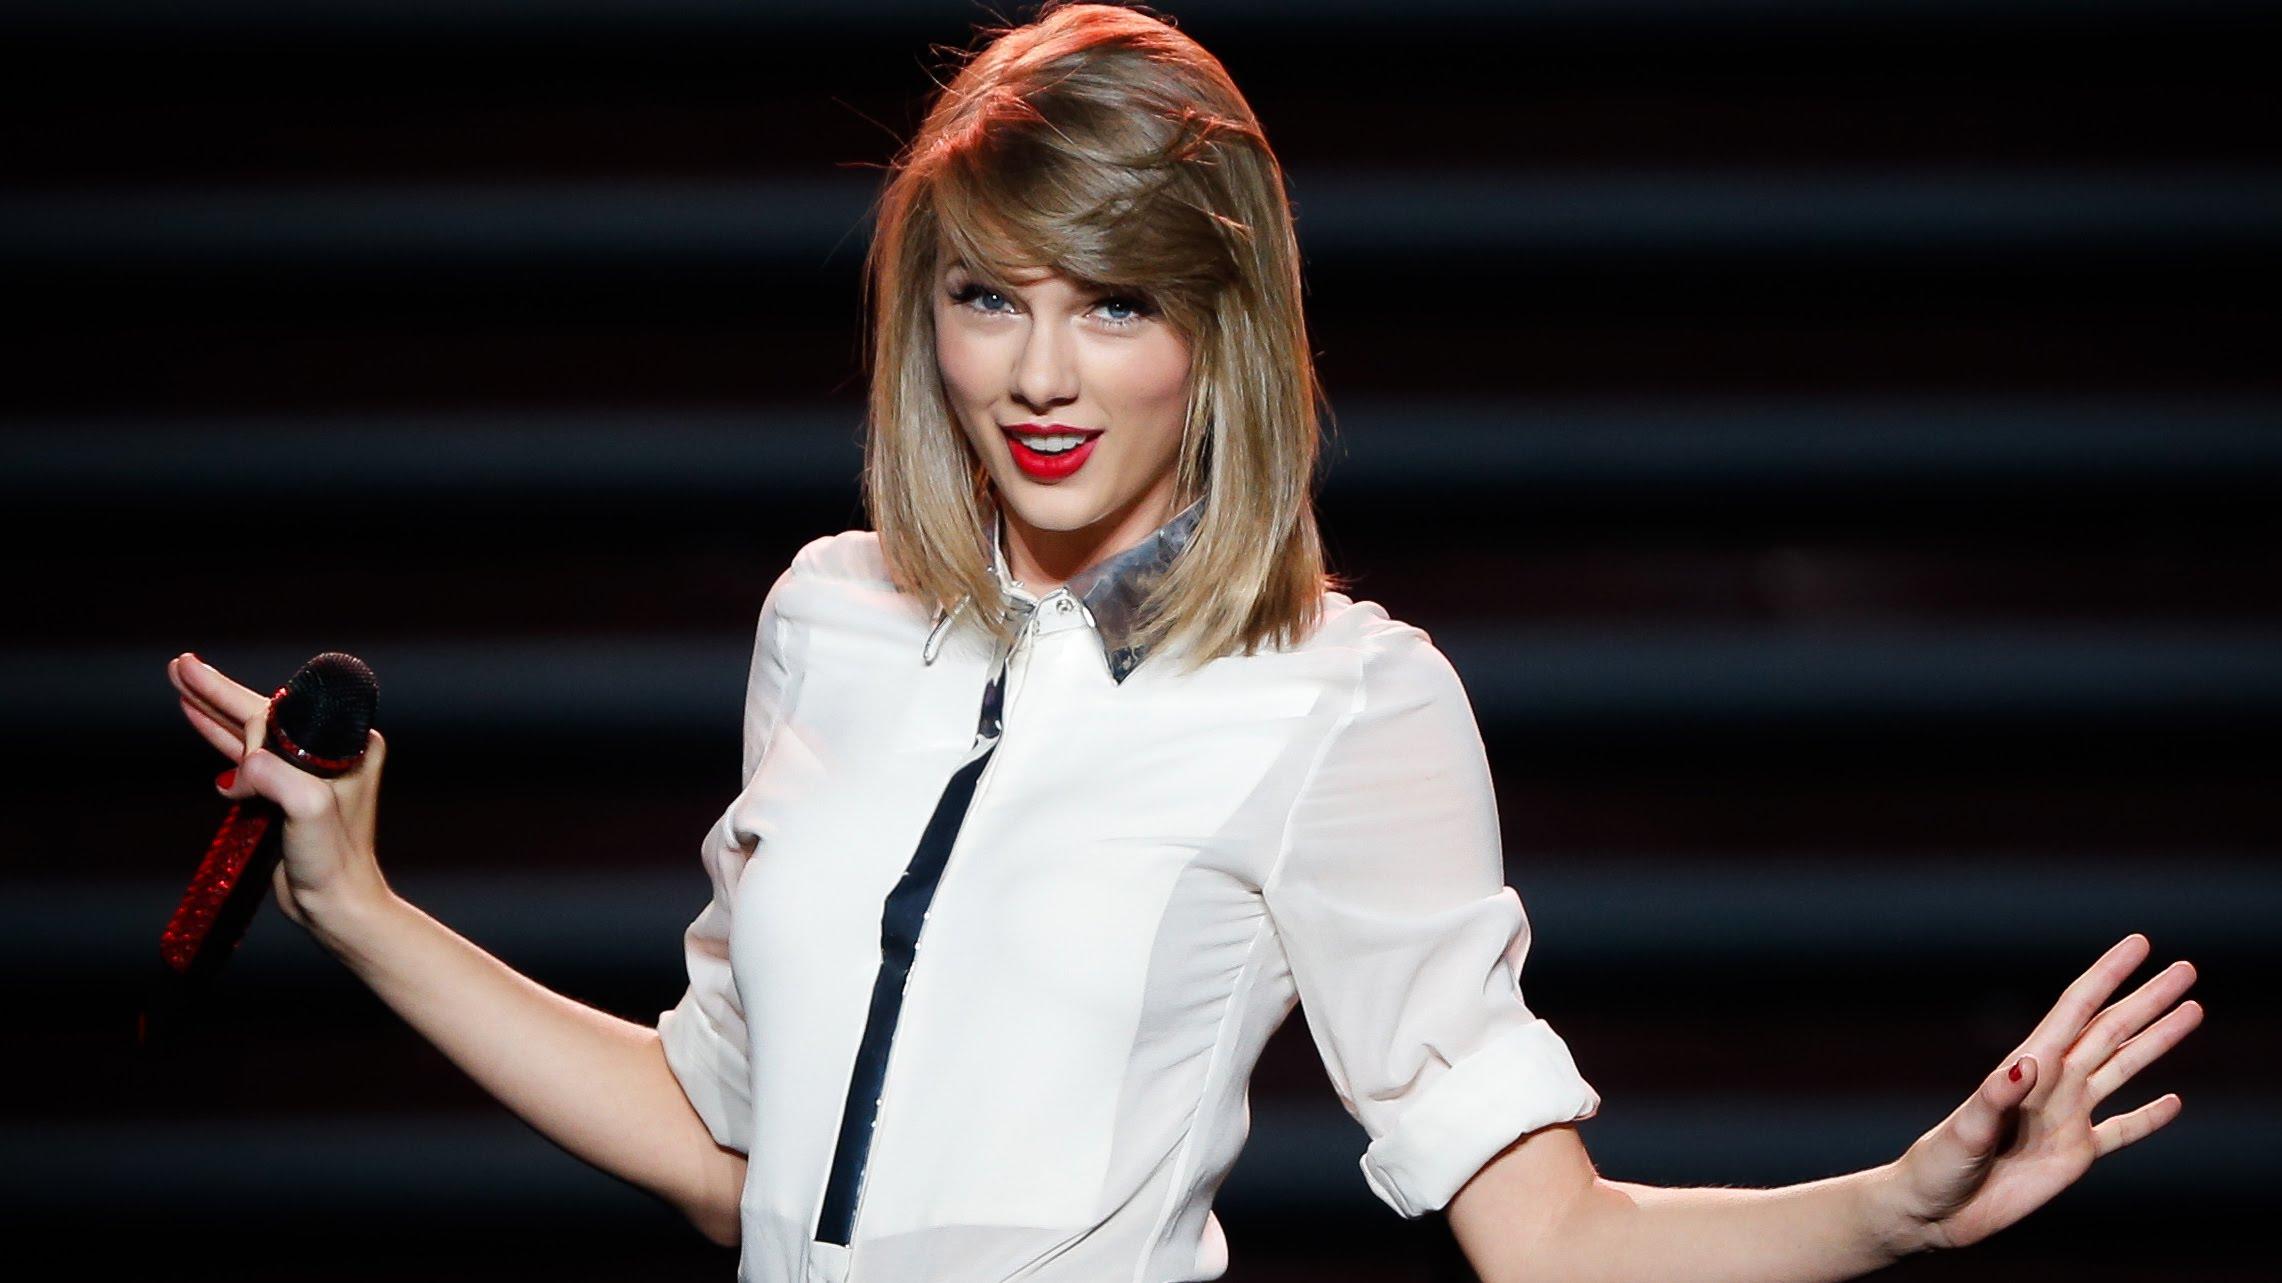 [edit] radio Taylor Swift - Style | [edit] radio